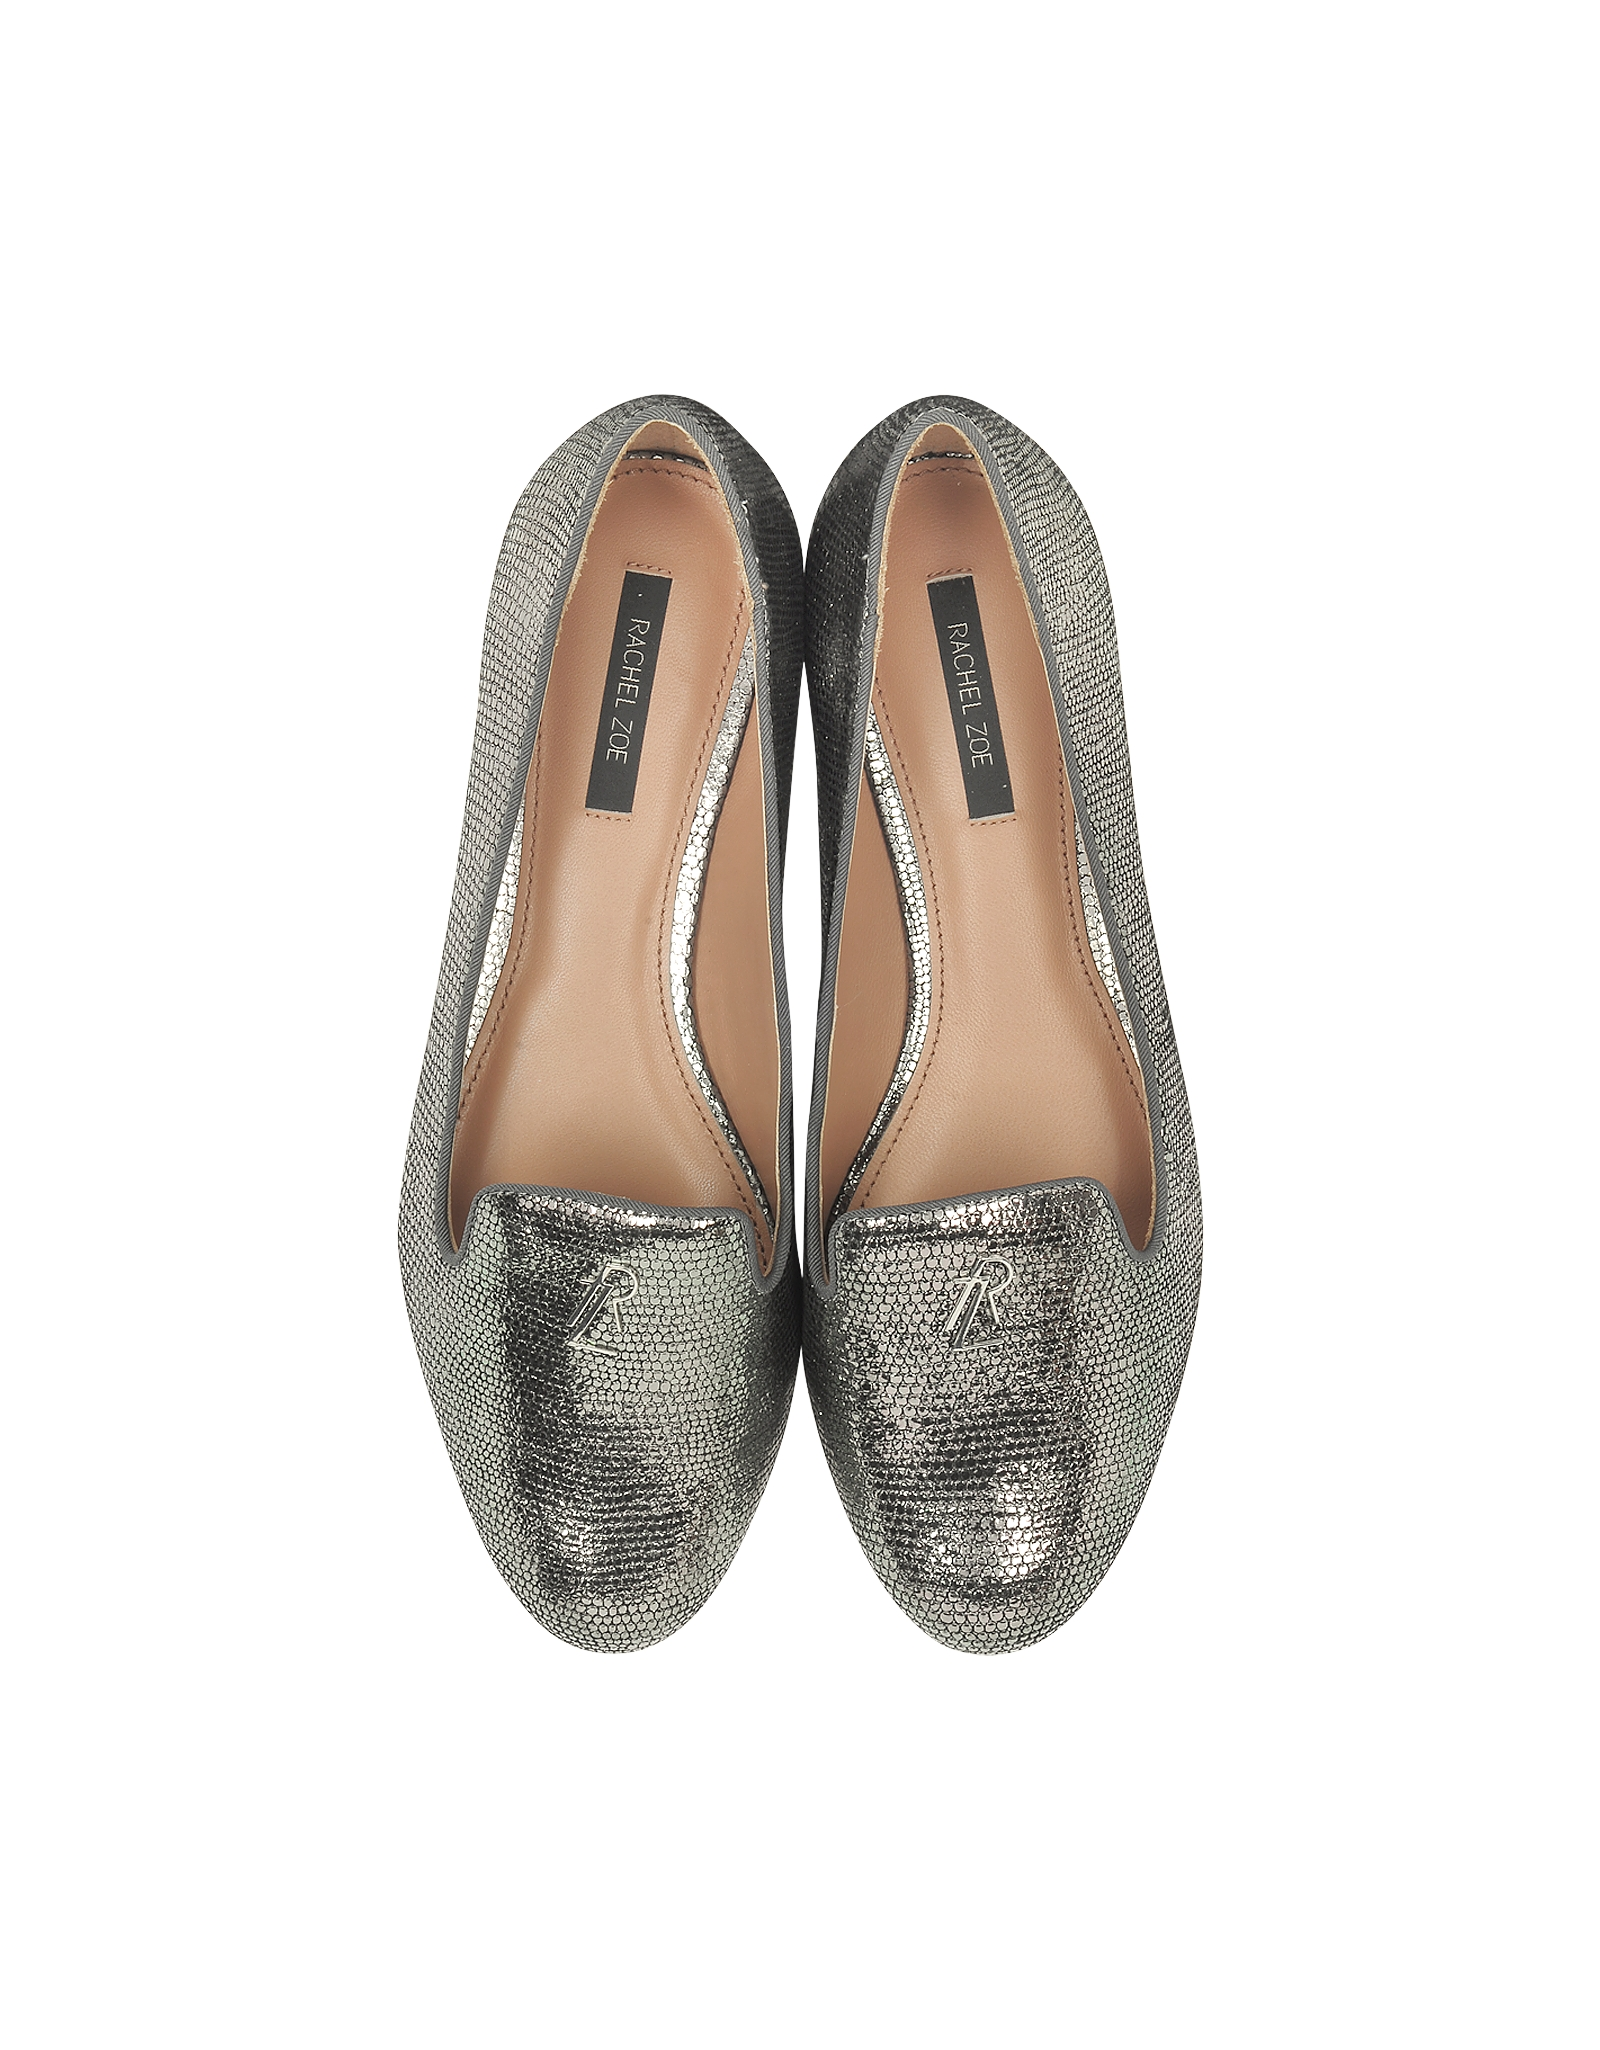 2b68a76f454 Lyst - Rachel Zoe Zahara Metallic Lizard Loafer in Metallic